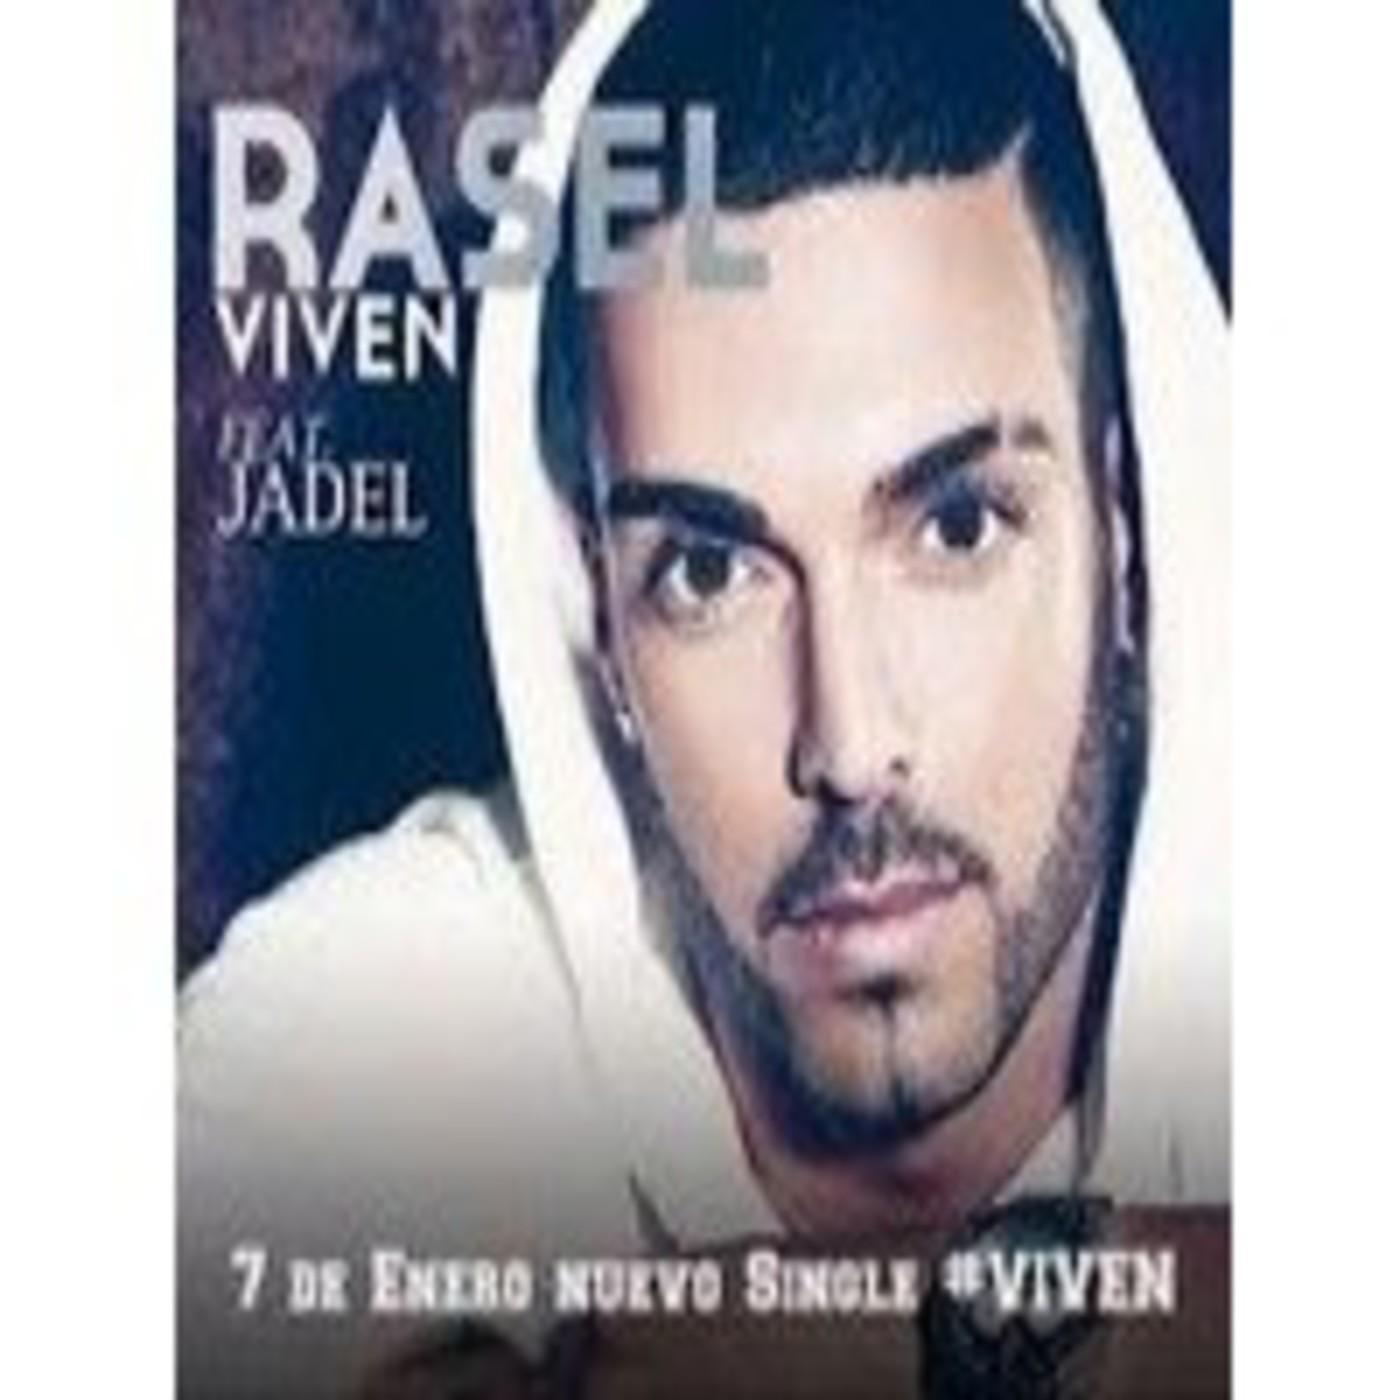 rasel ft jadel viven descargar